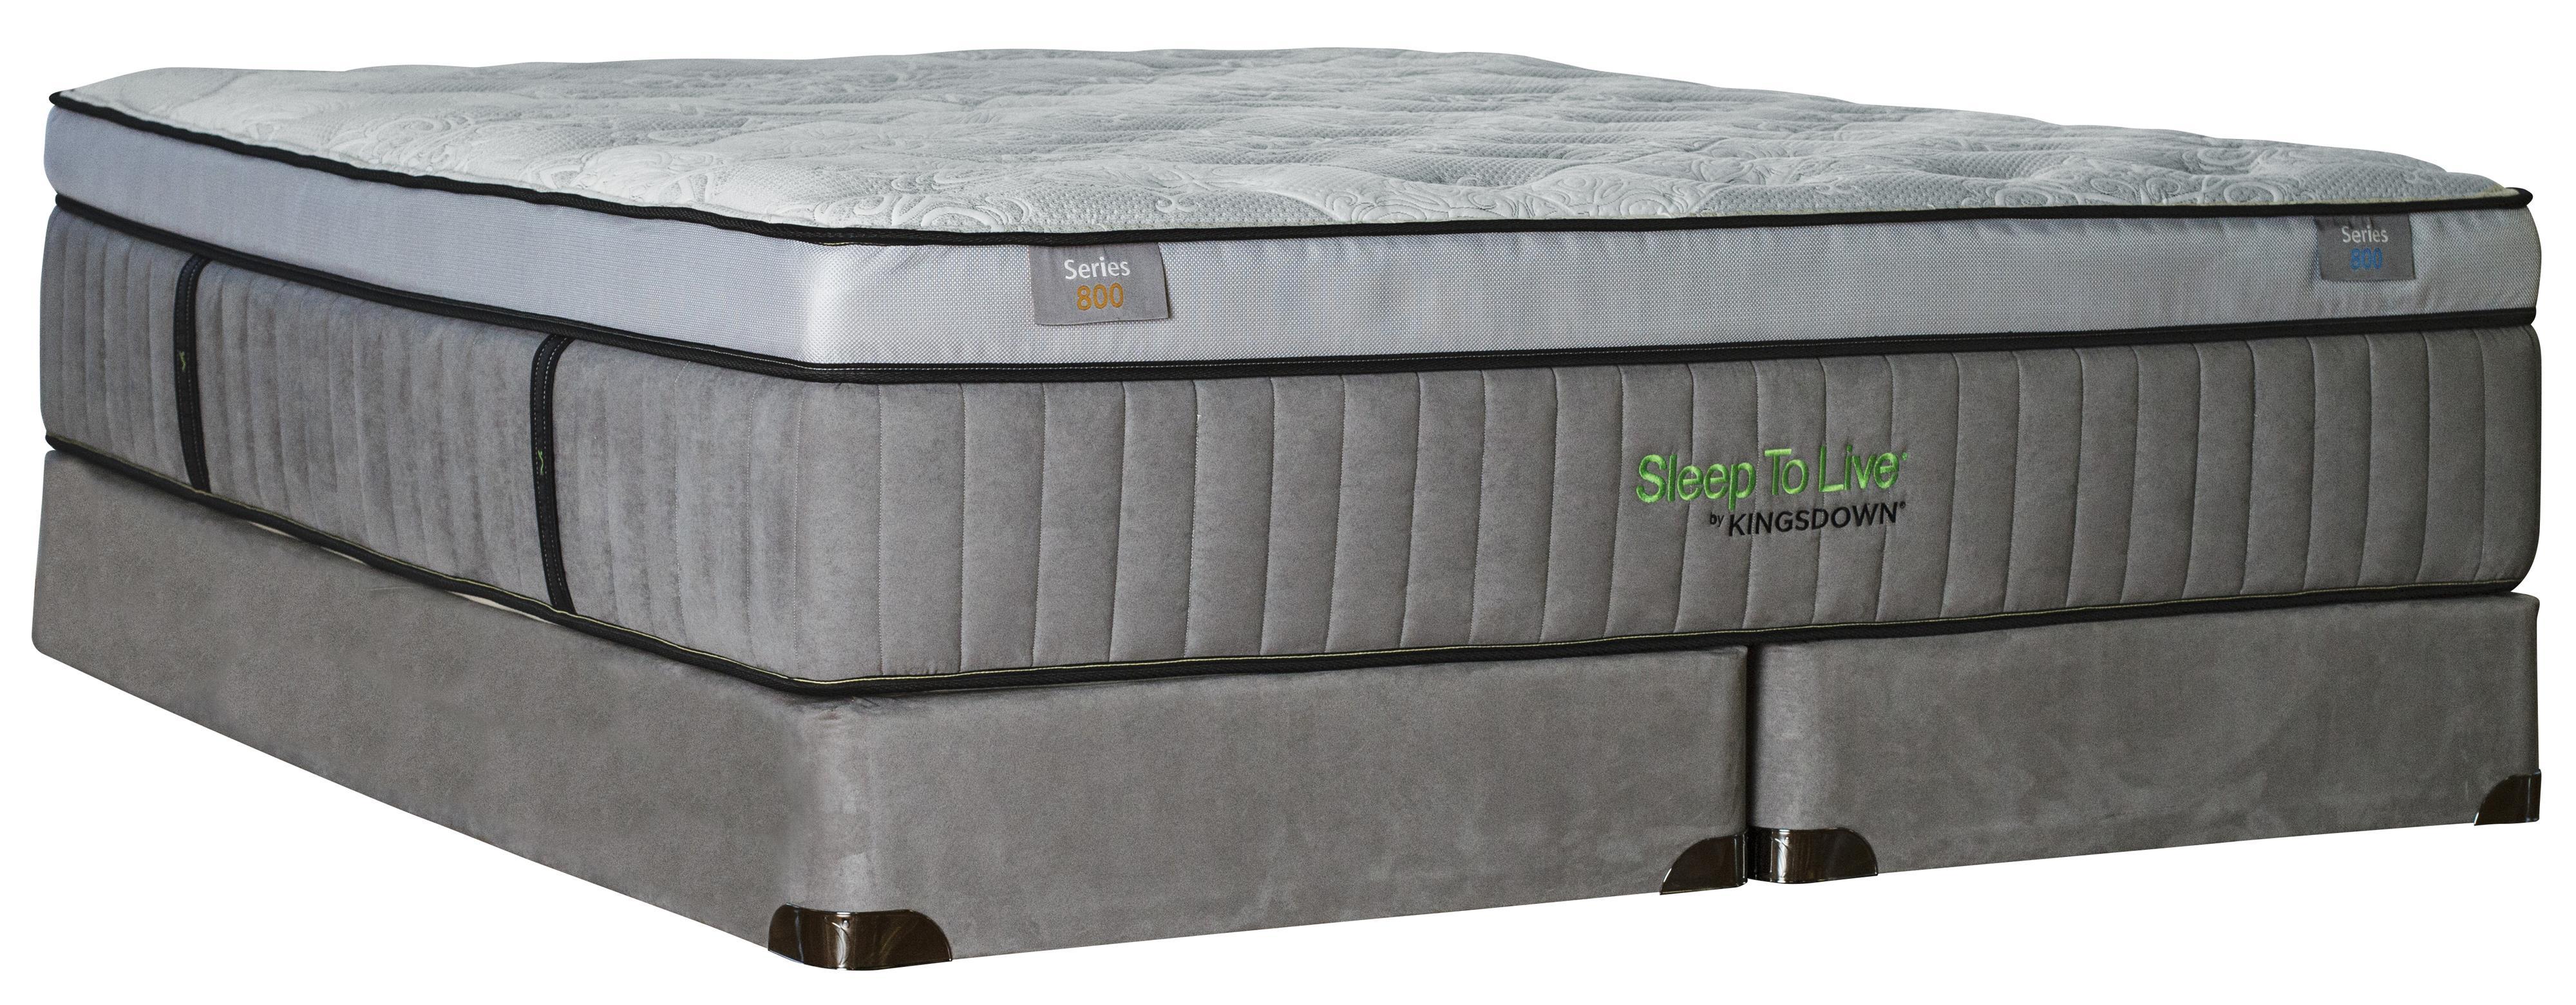 Kingsdown Sleep to Live 800 Twin Luxurios Box Top Mattress - Item Number: Series800-T